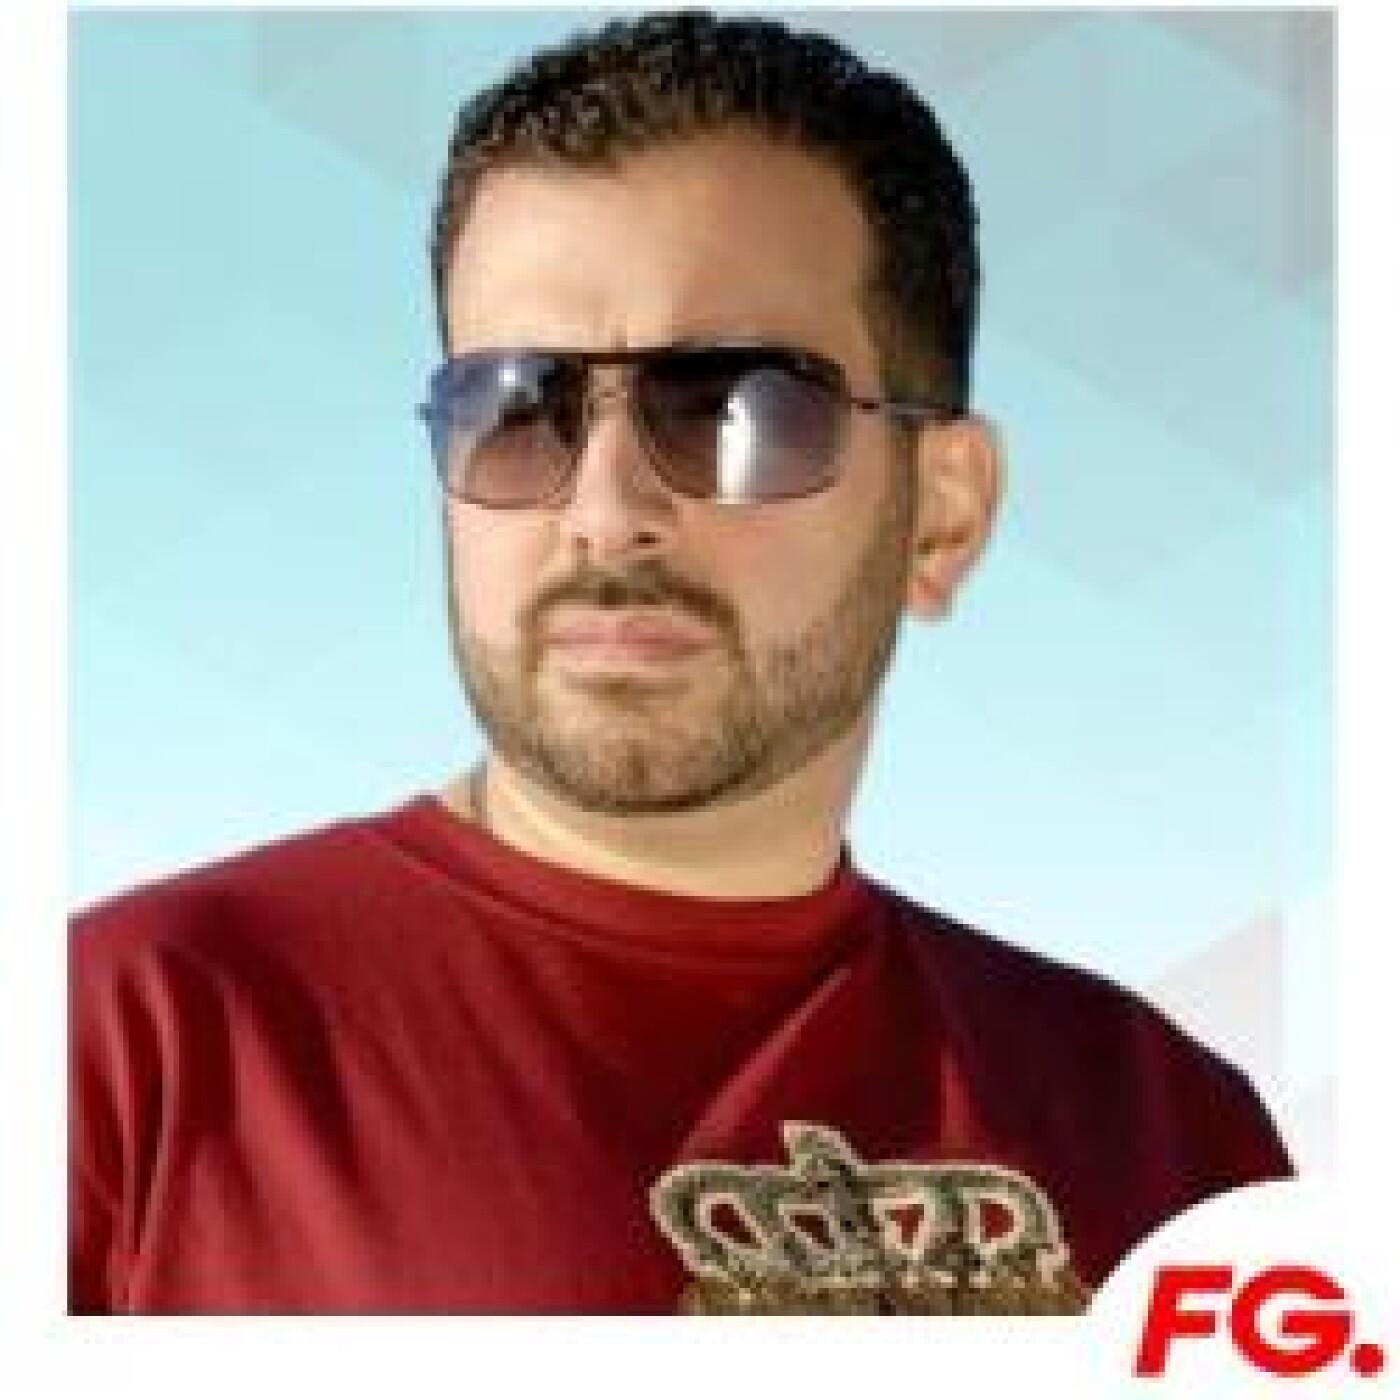 CLUB FG : LENNY FONTANA